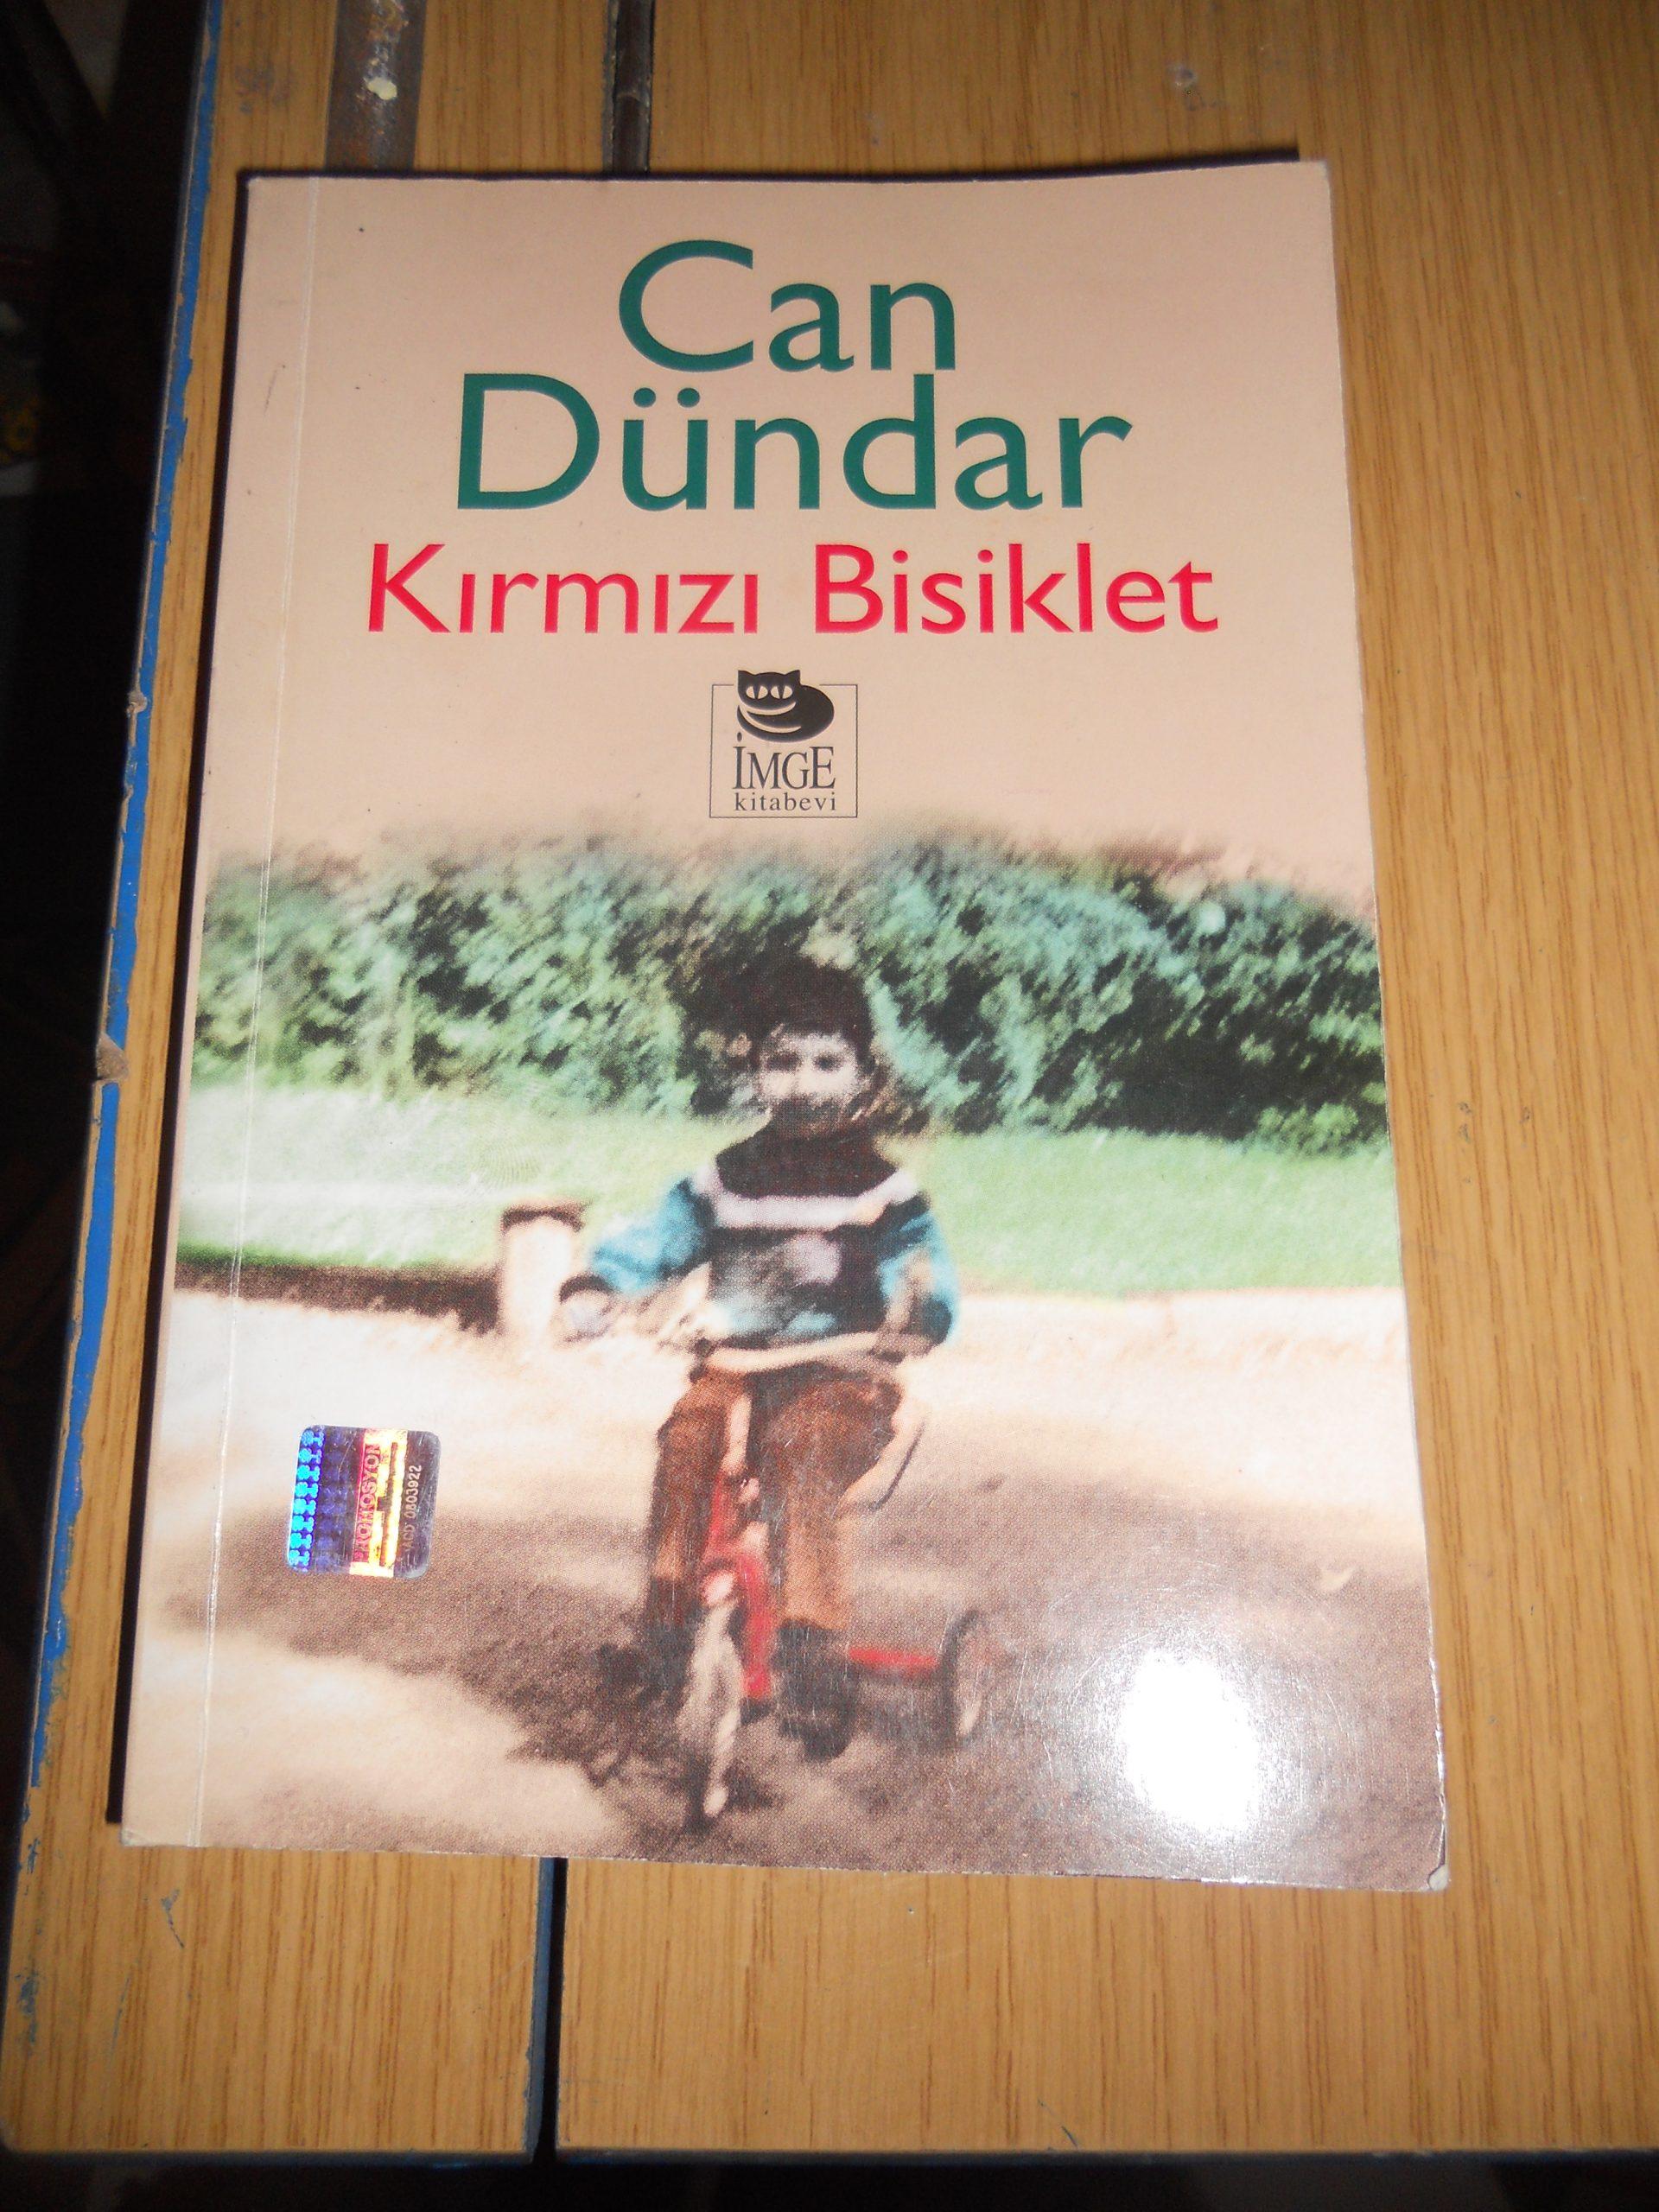 KIRMIZI BİSİKLET/CAN DÜNDAR/10 tl